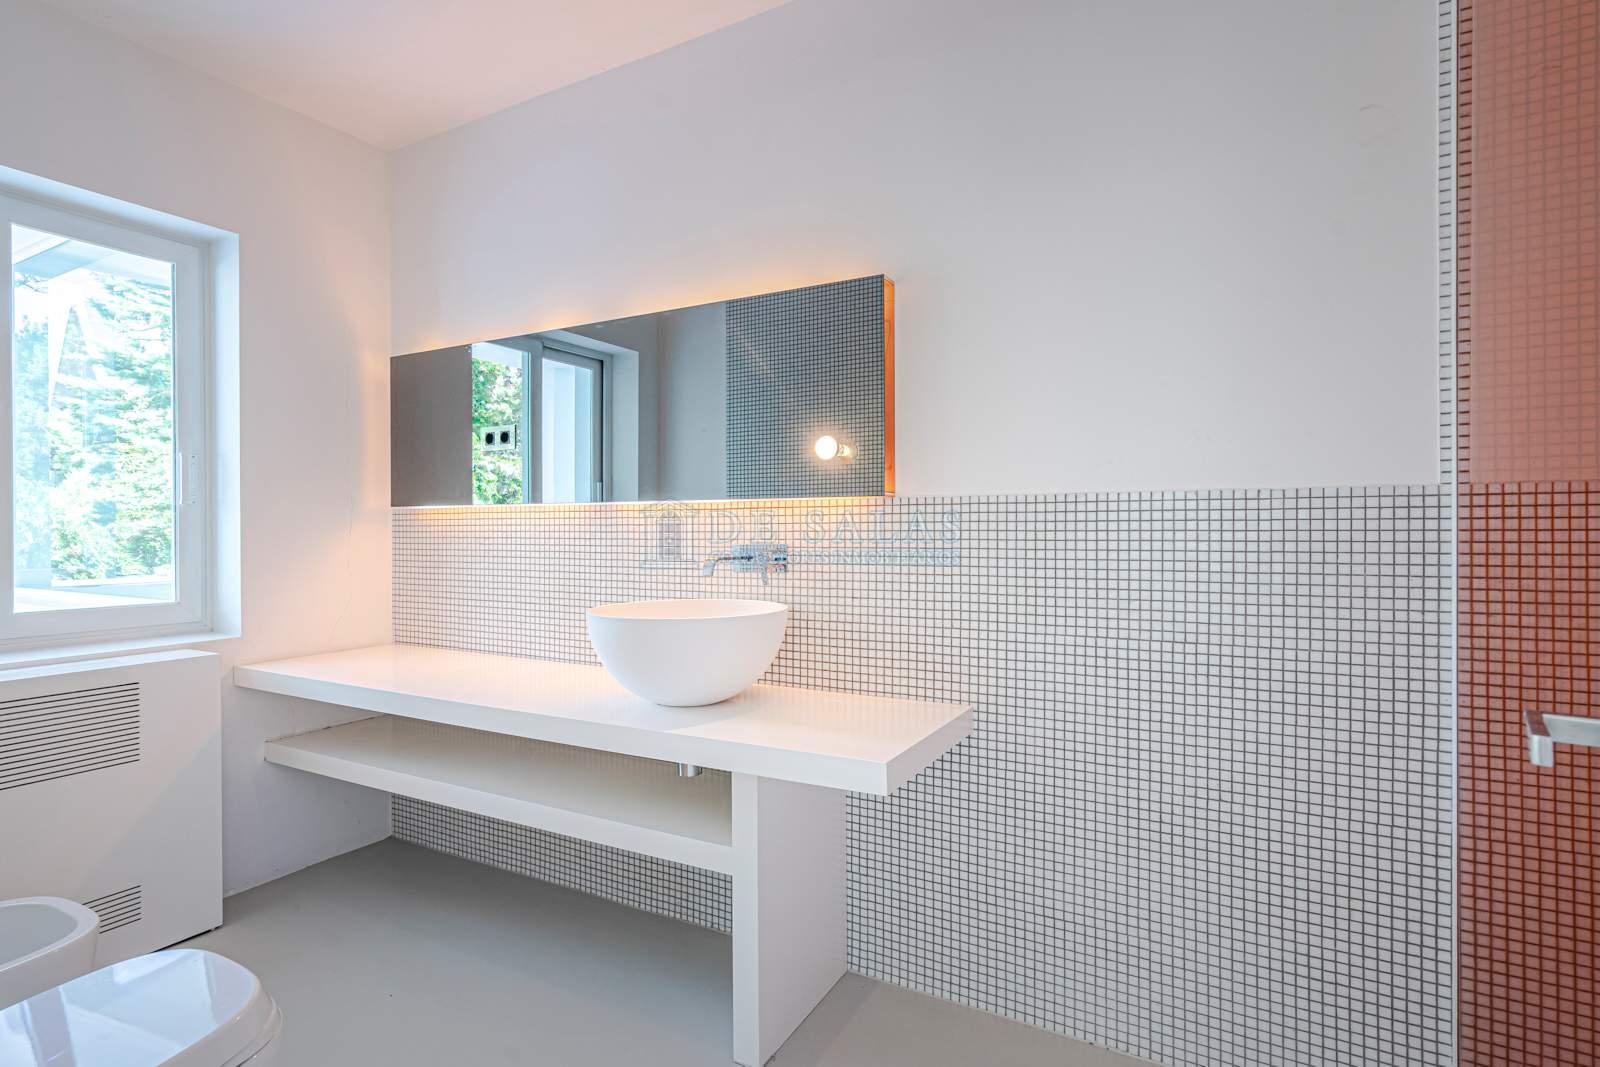 Baño-0019 House La Moraleja